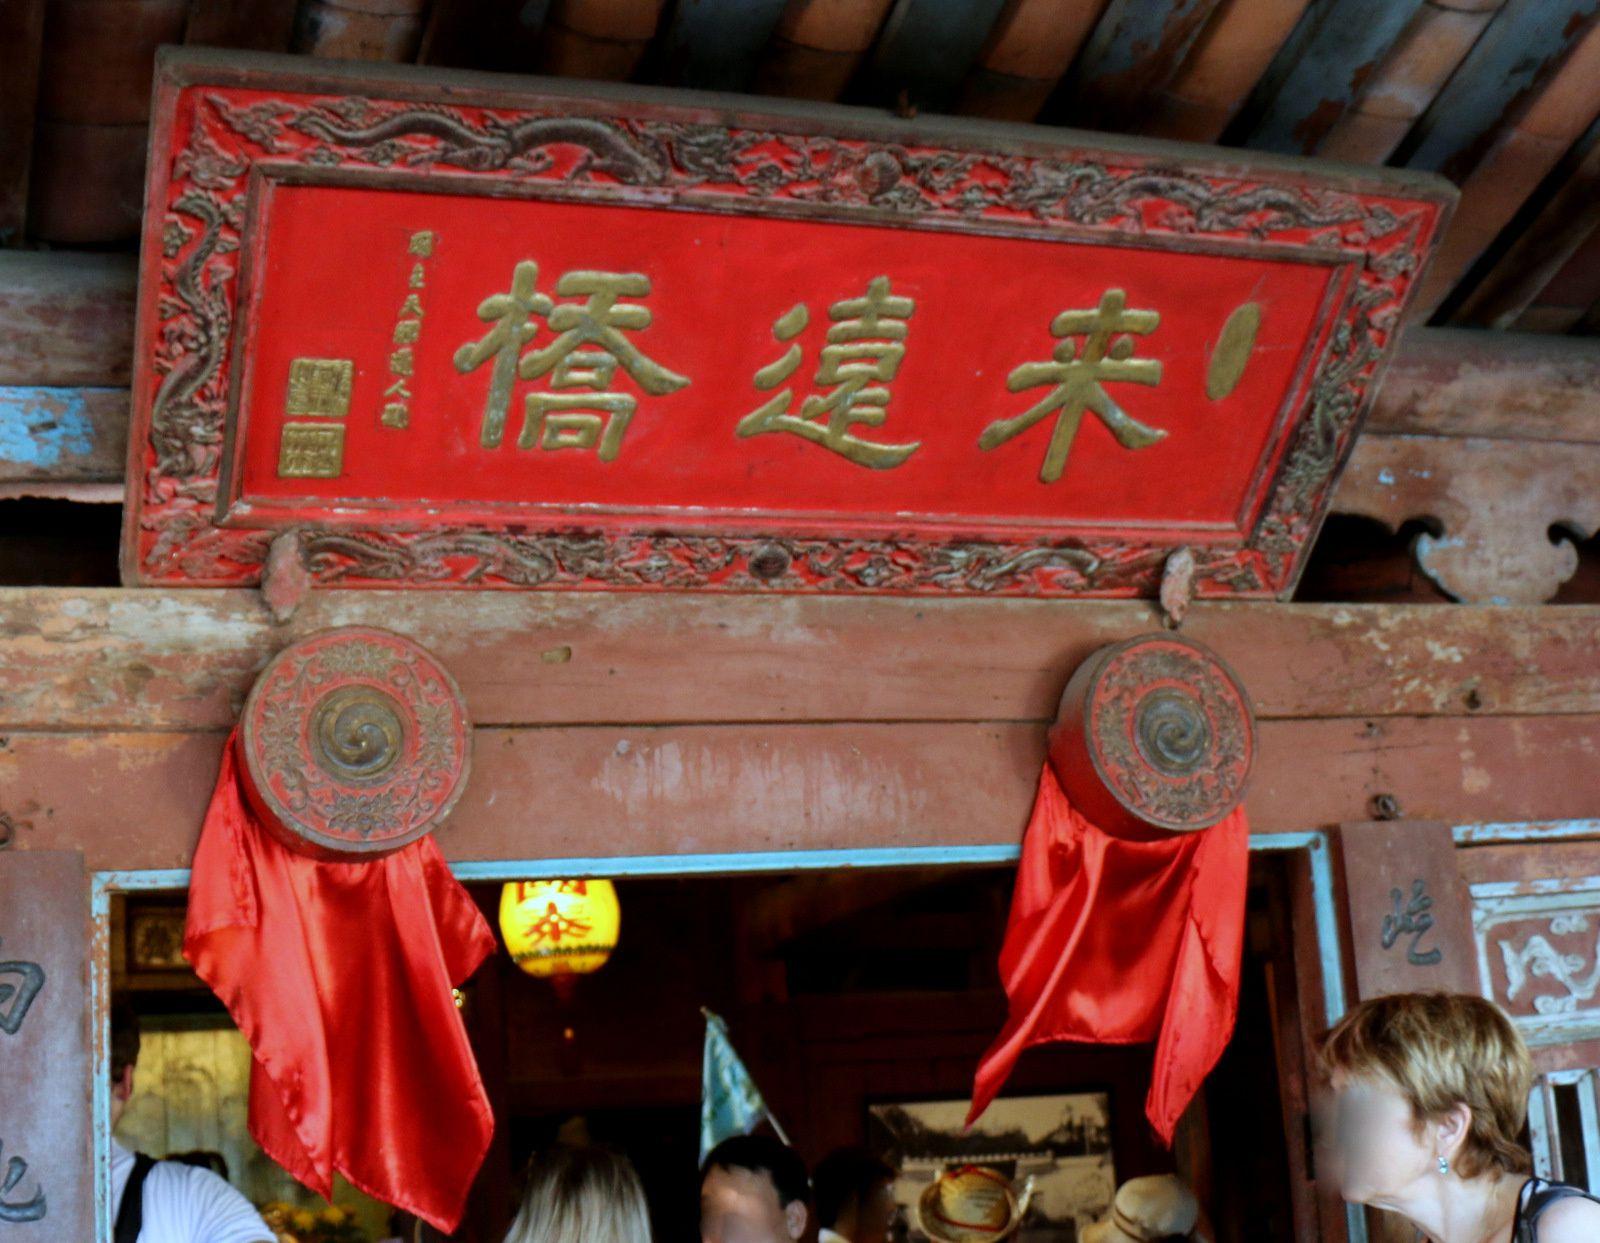 Le pont-pagode japonais (Chùa Cầu), Hội An